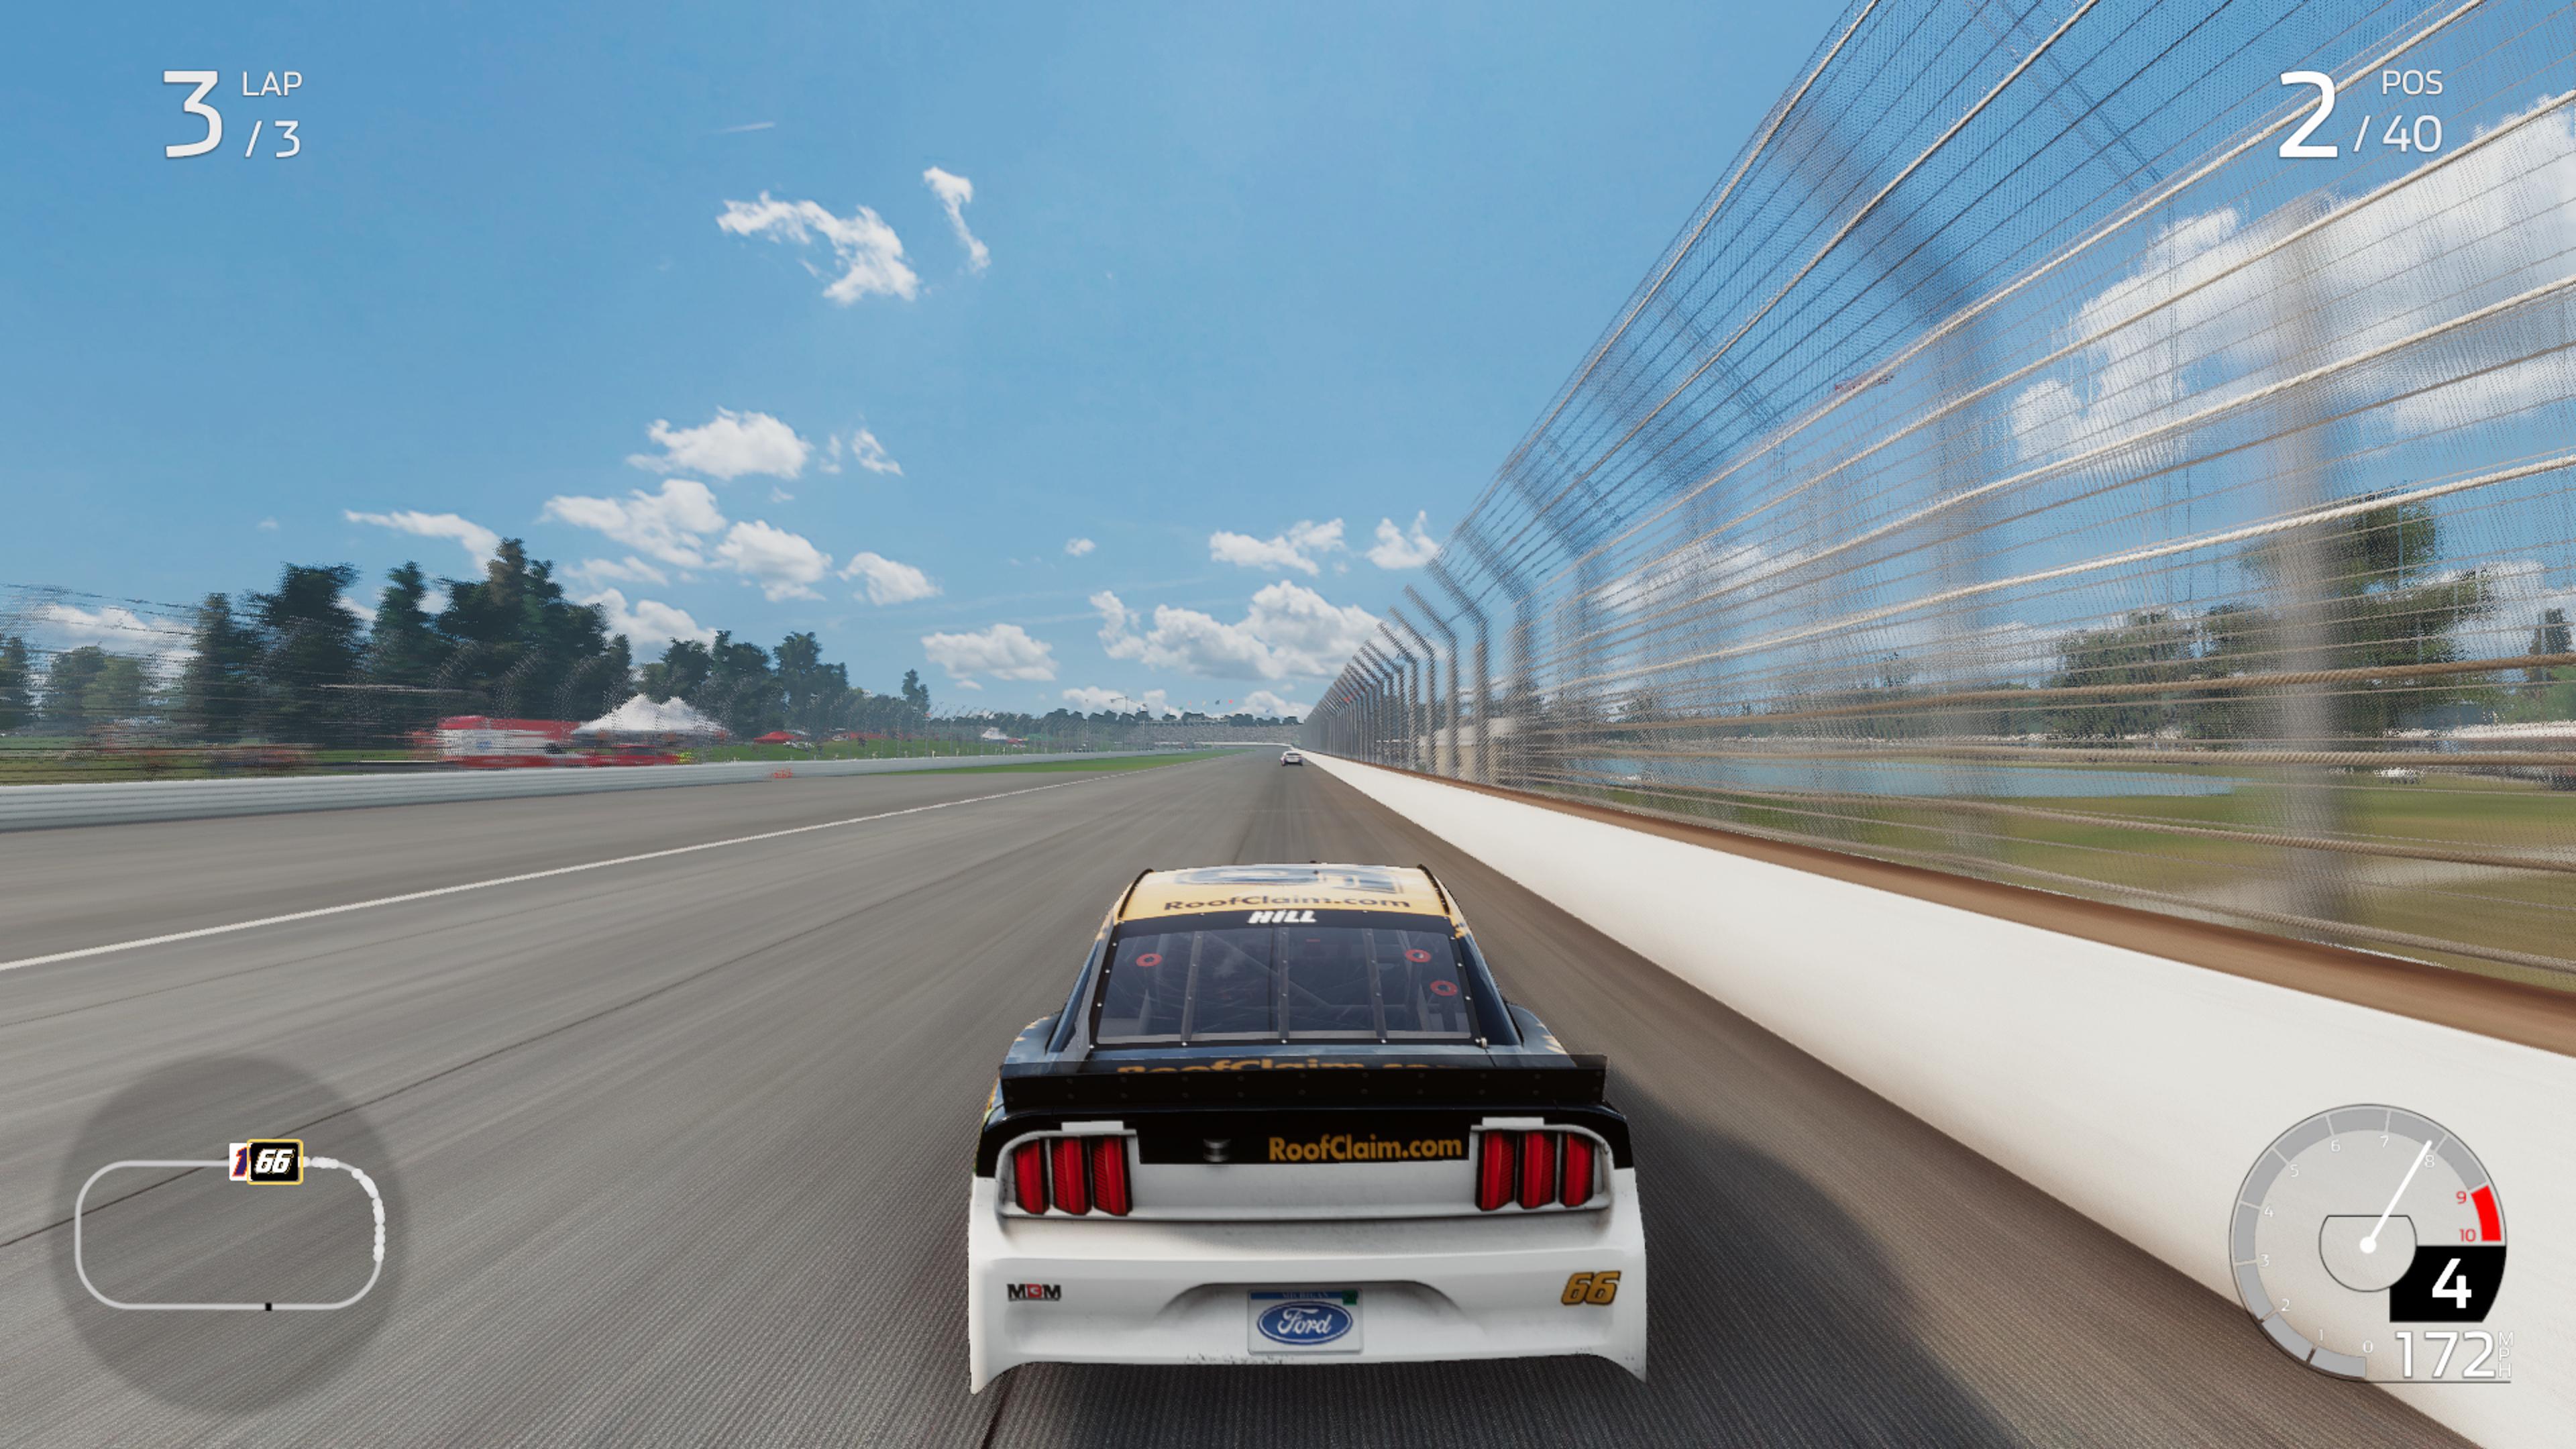 DaniloDlaker NASCARHeat5 20200721 03 04 54